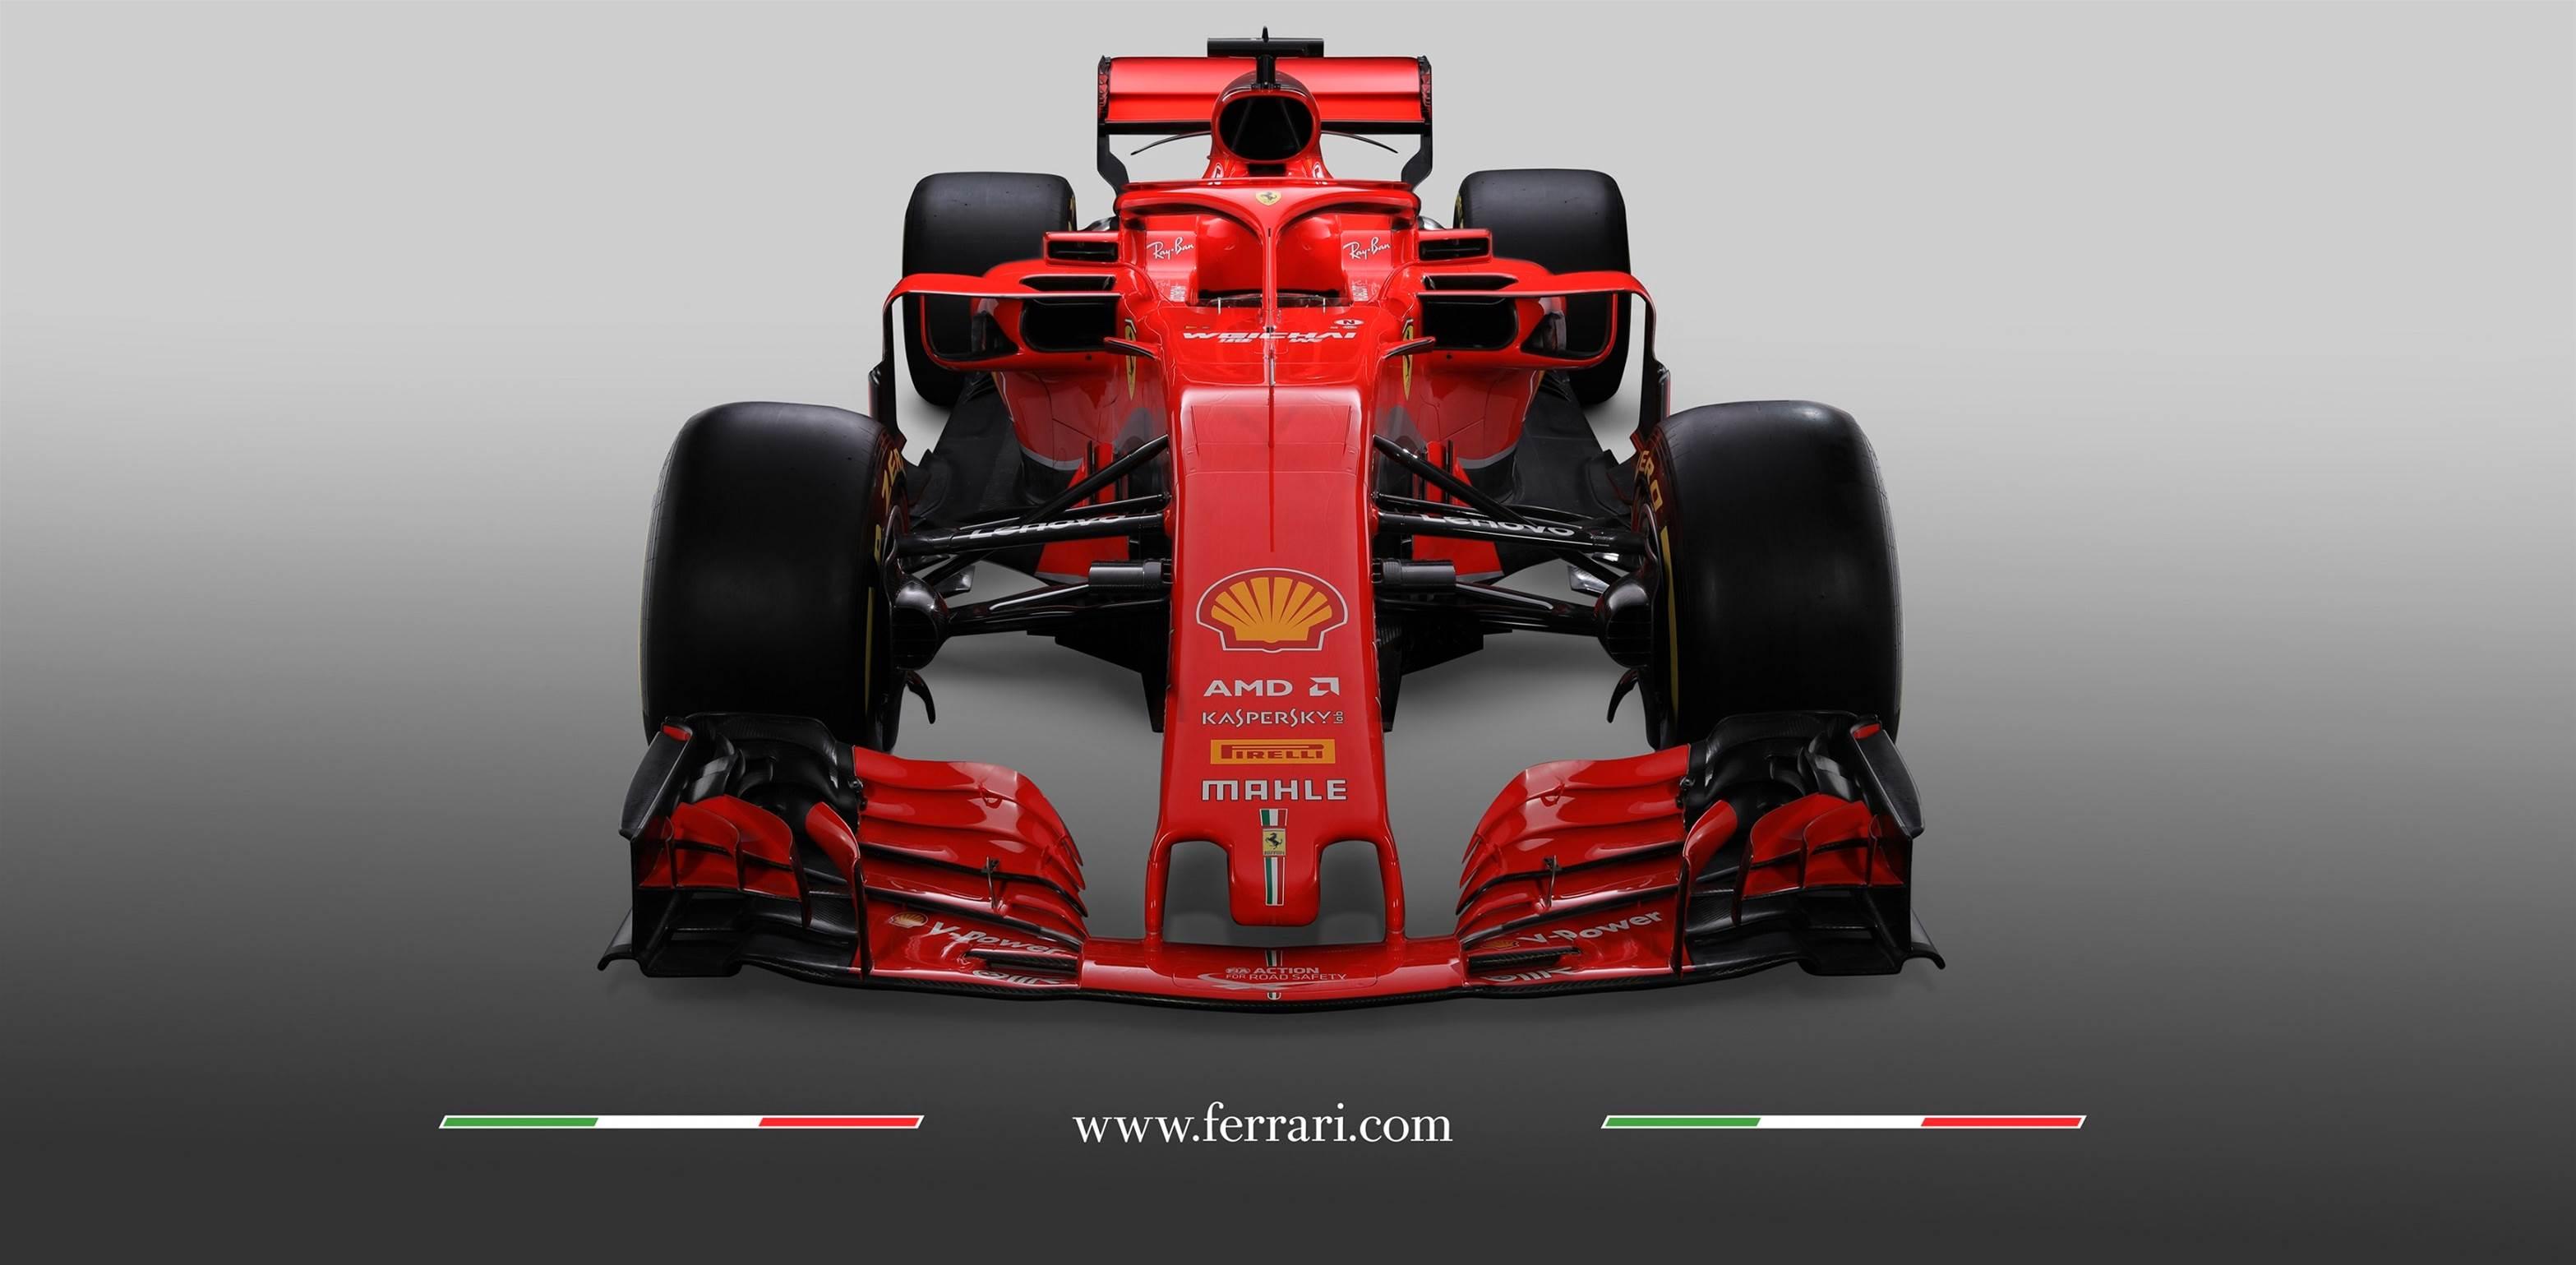 Vettel and Raikkonen on the new Ferrari